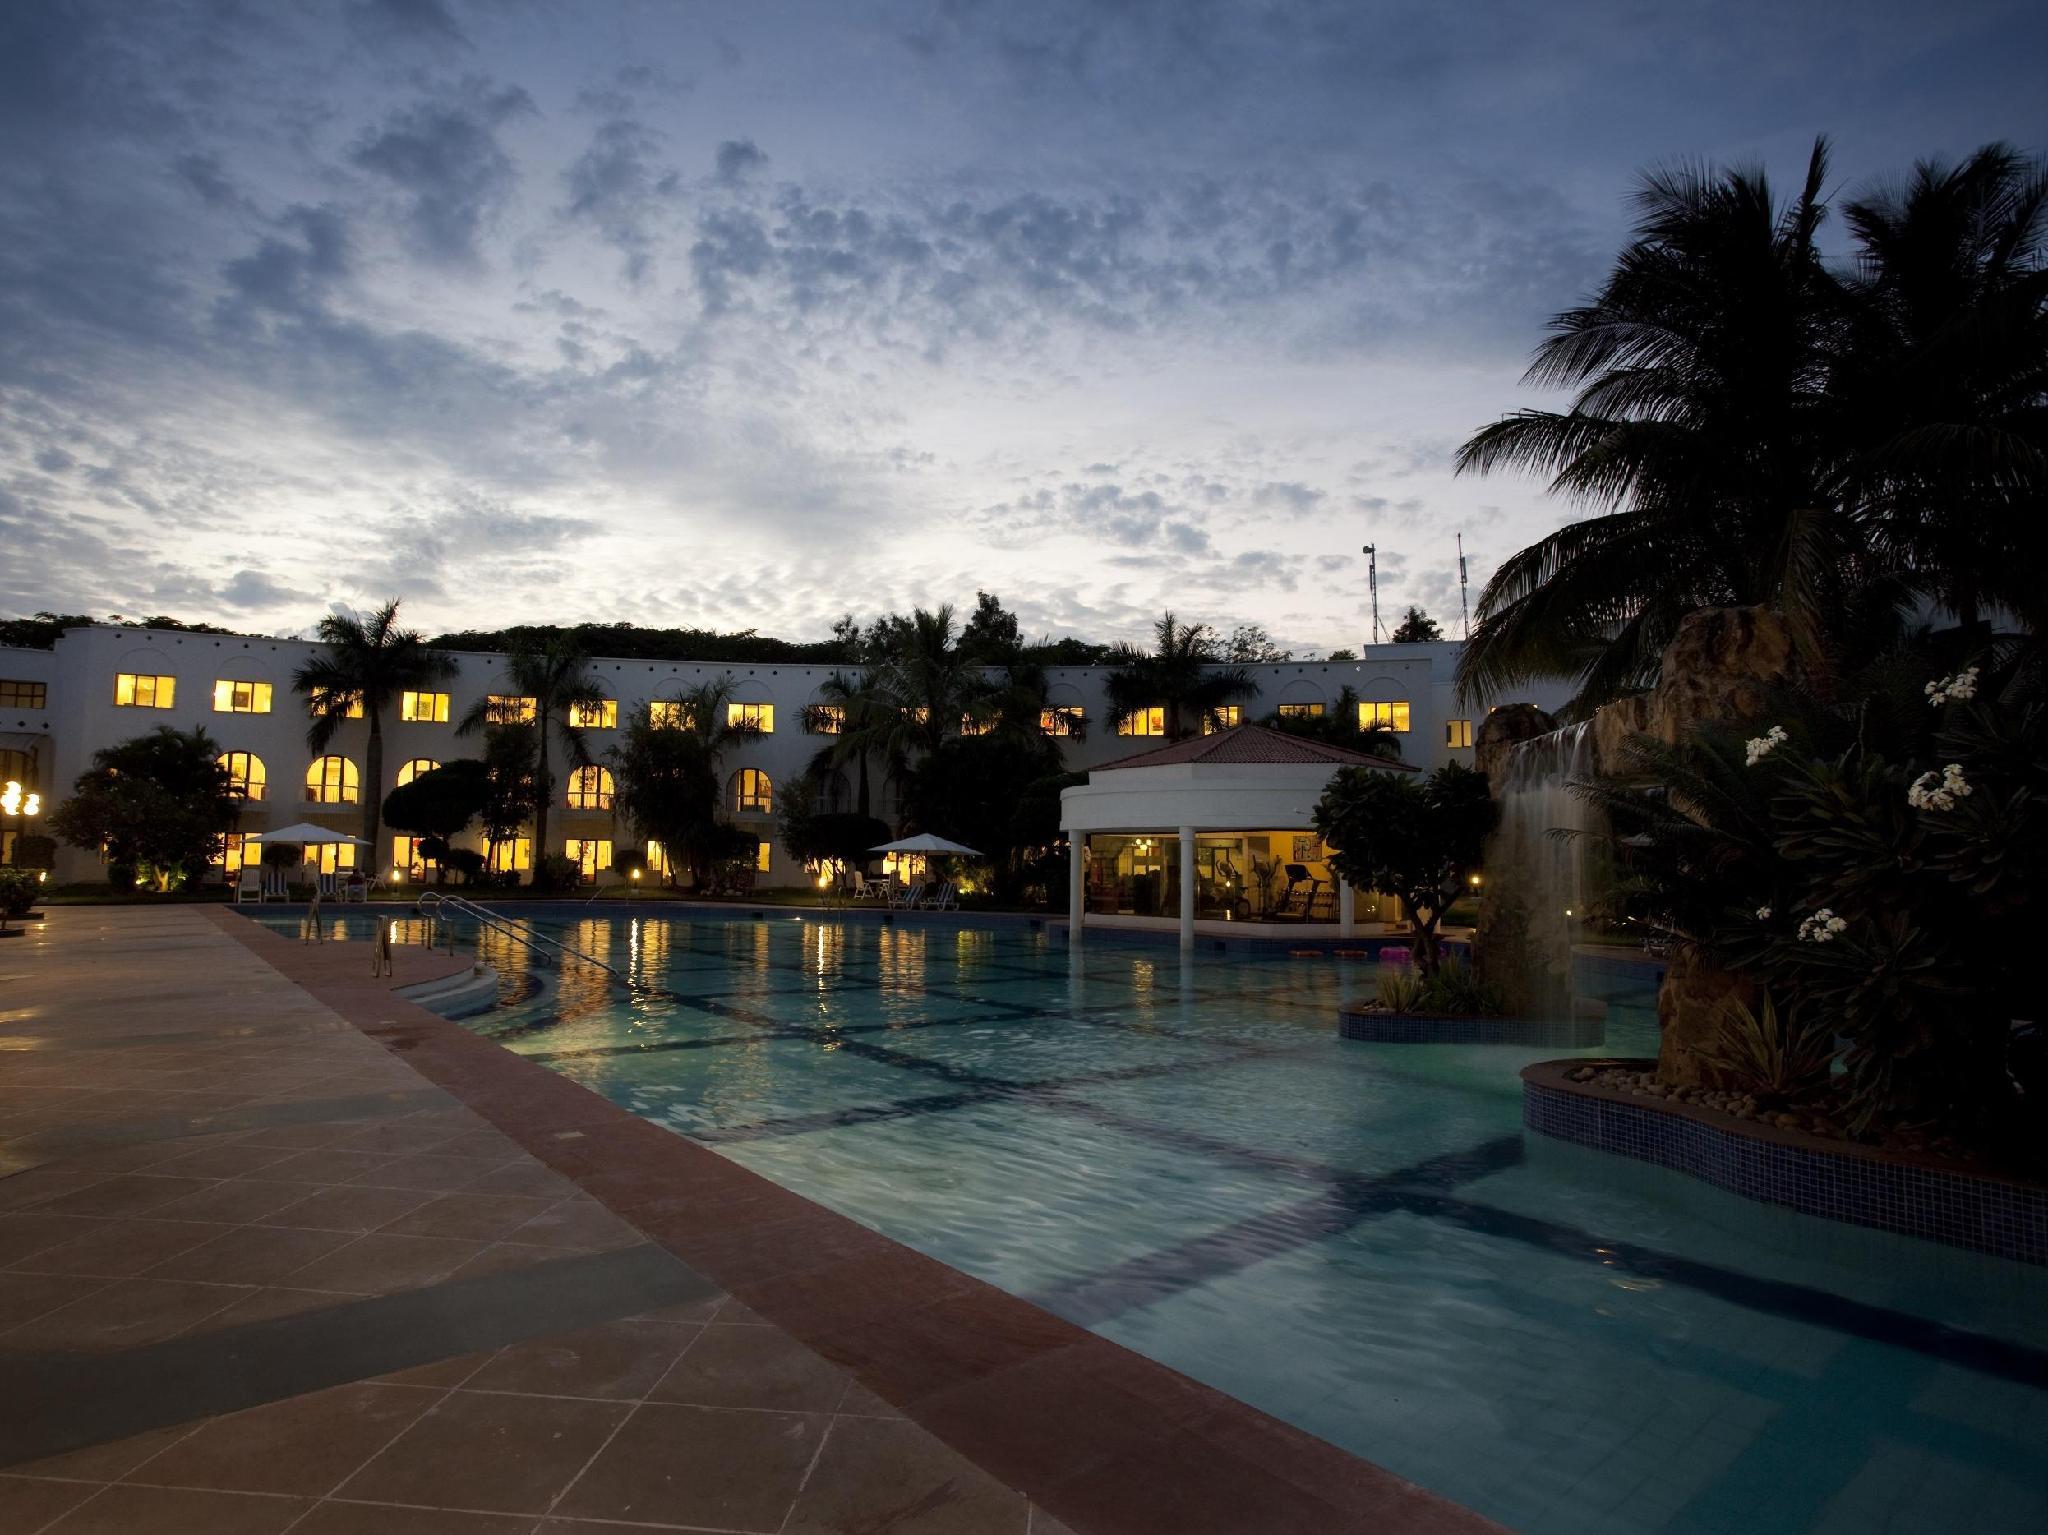 Lemon Tree Hotel Aurangabad - Hotell och Boende i Indien i Aurangabad